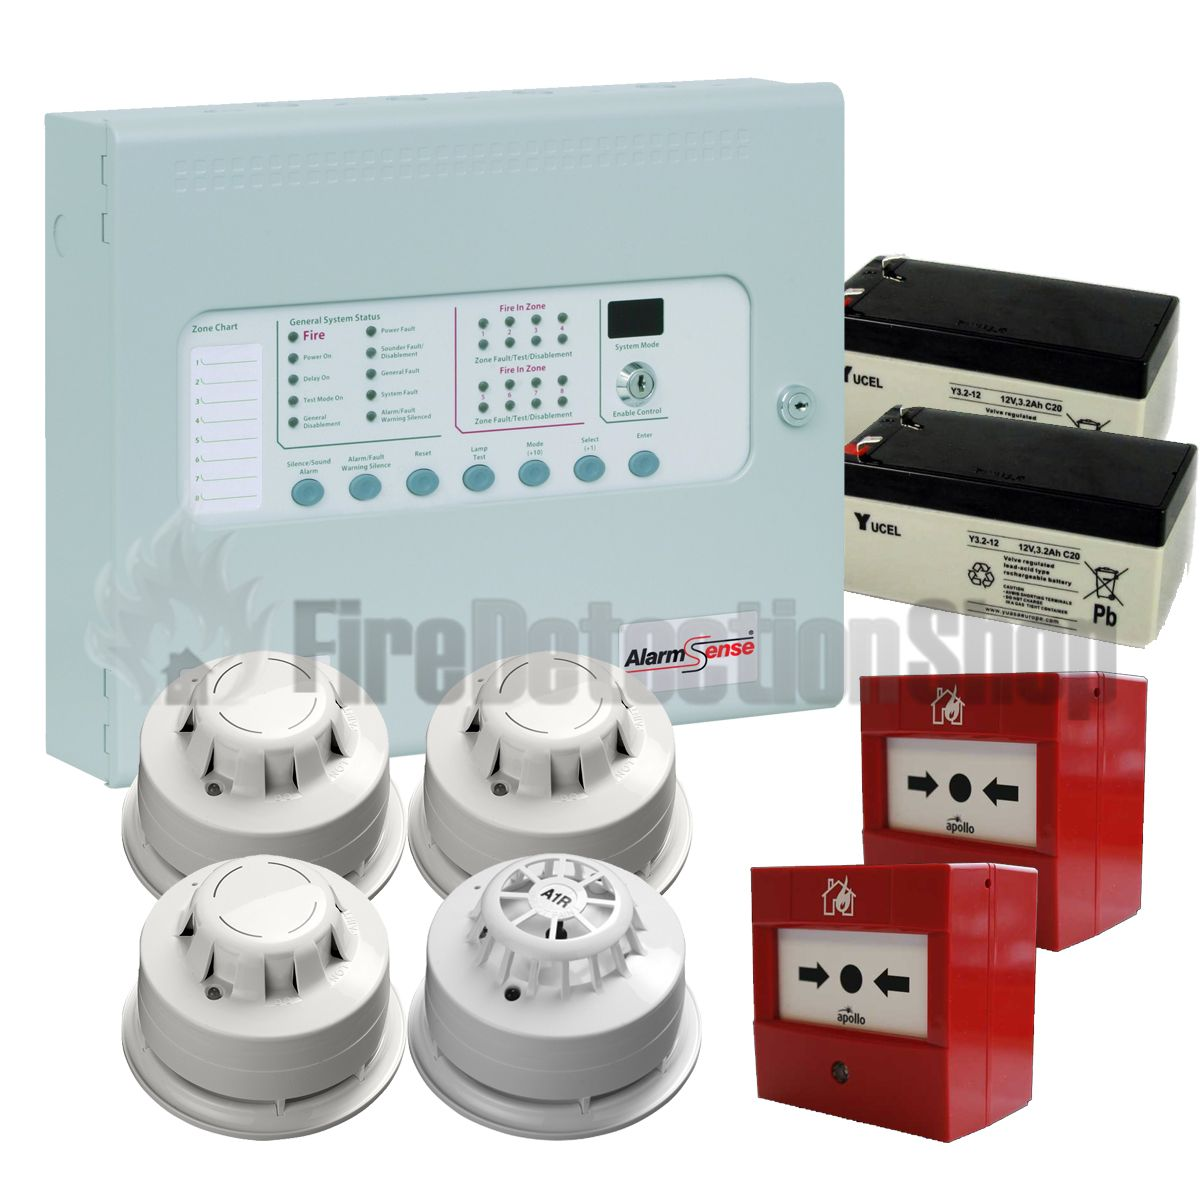 nest smoke detector wiring diagram hopkins trailer plug beautiful burglar alarm detectors 4 wires fire